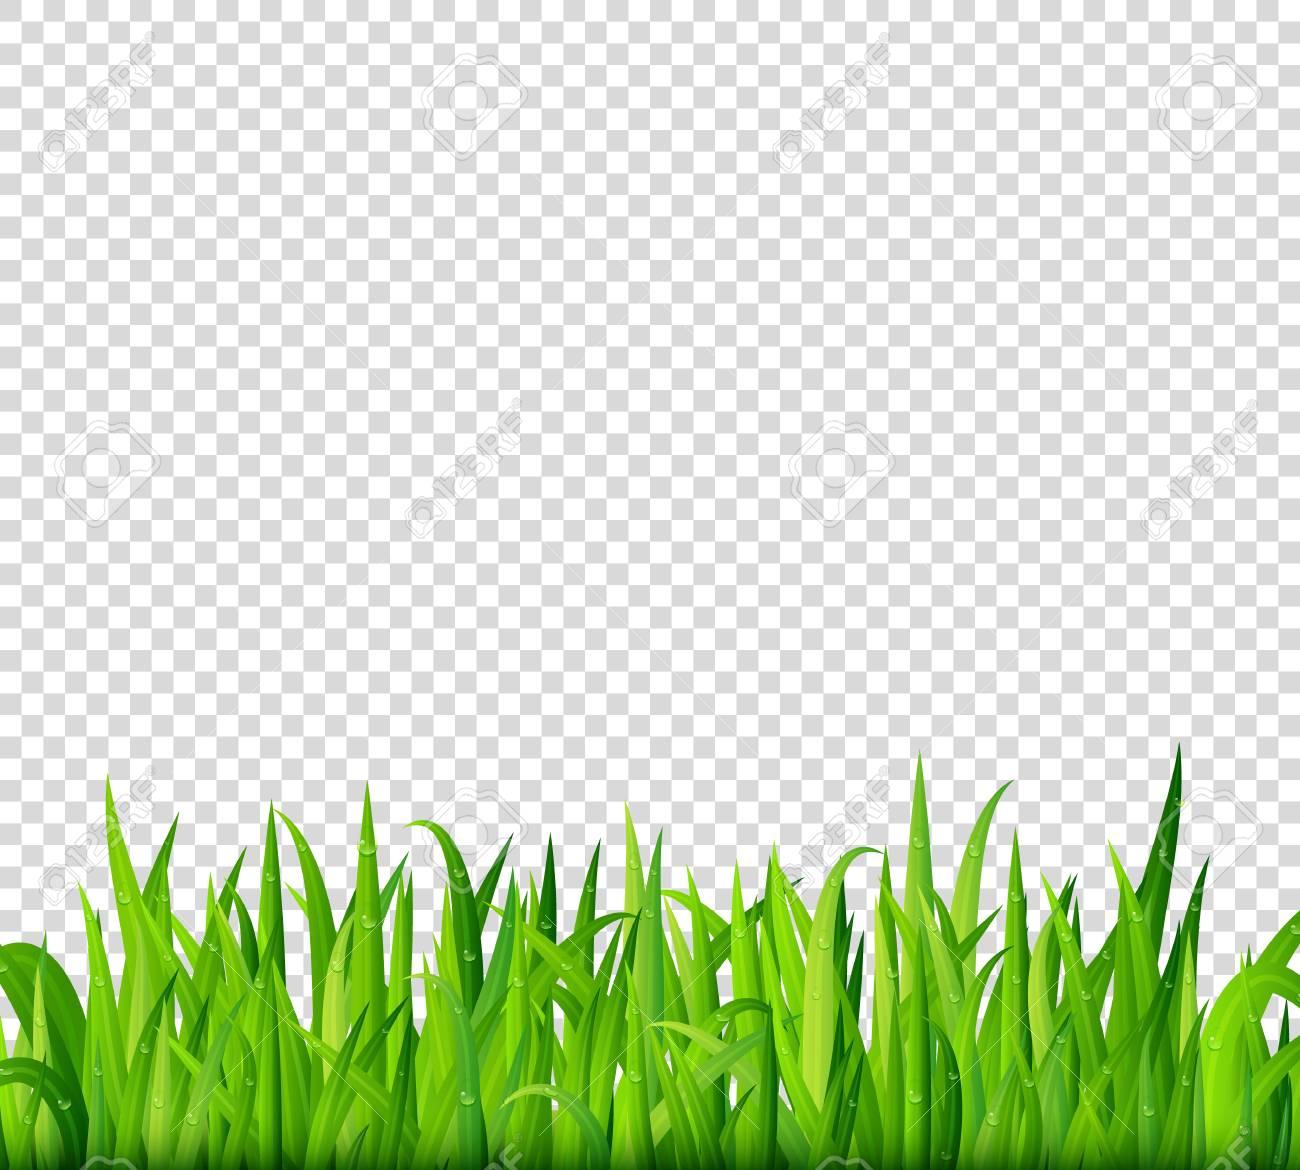 Grass Transparent Background & Free Grass Transparent.